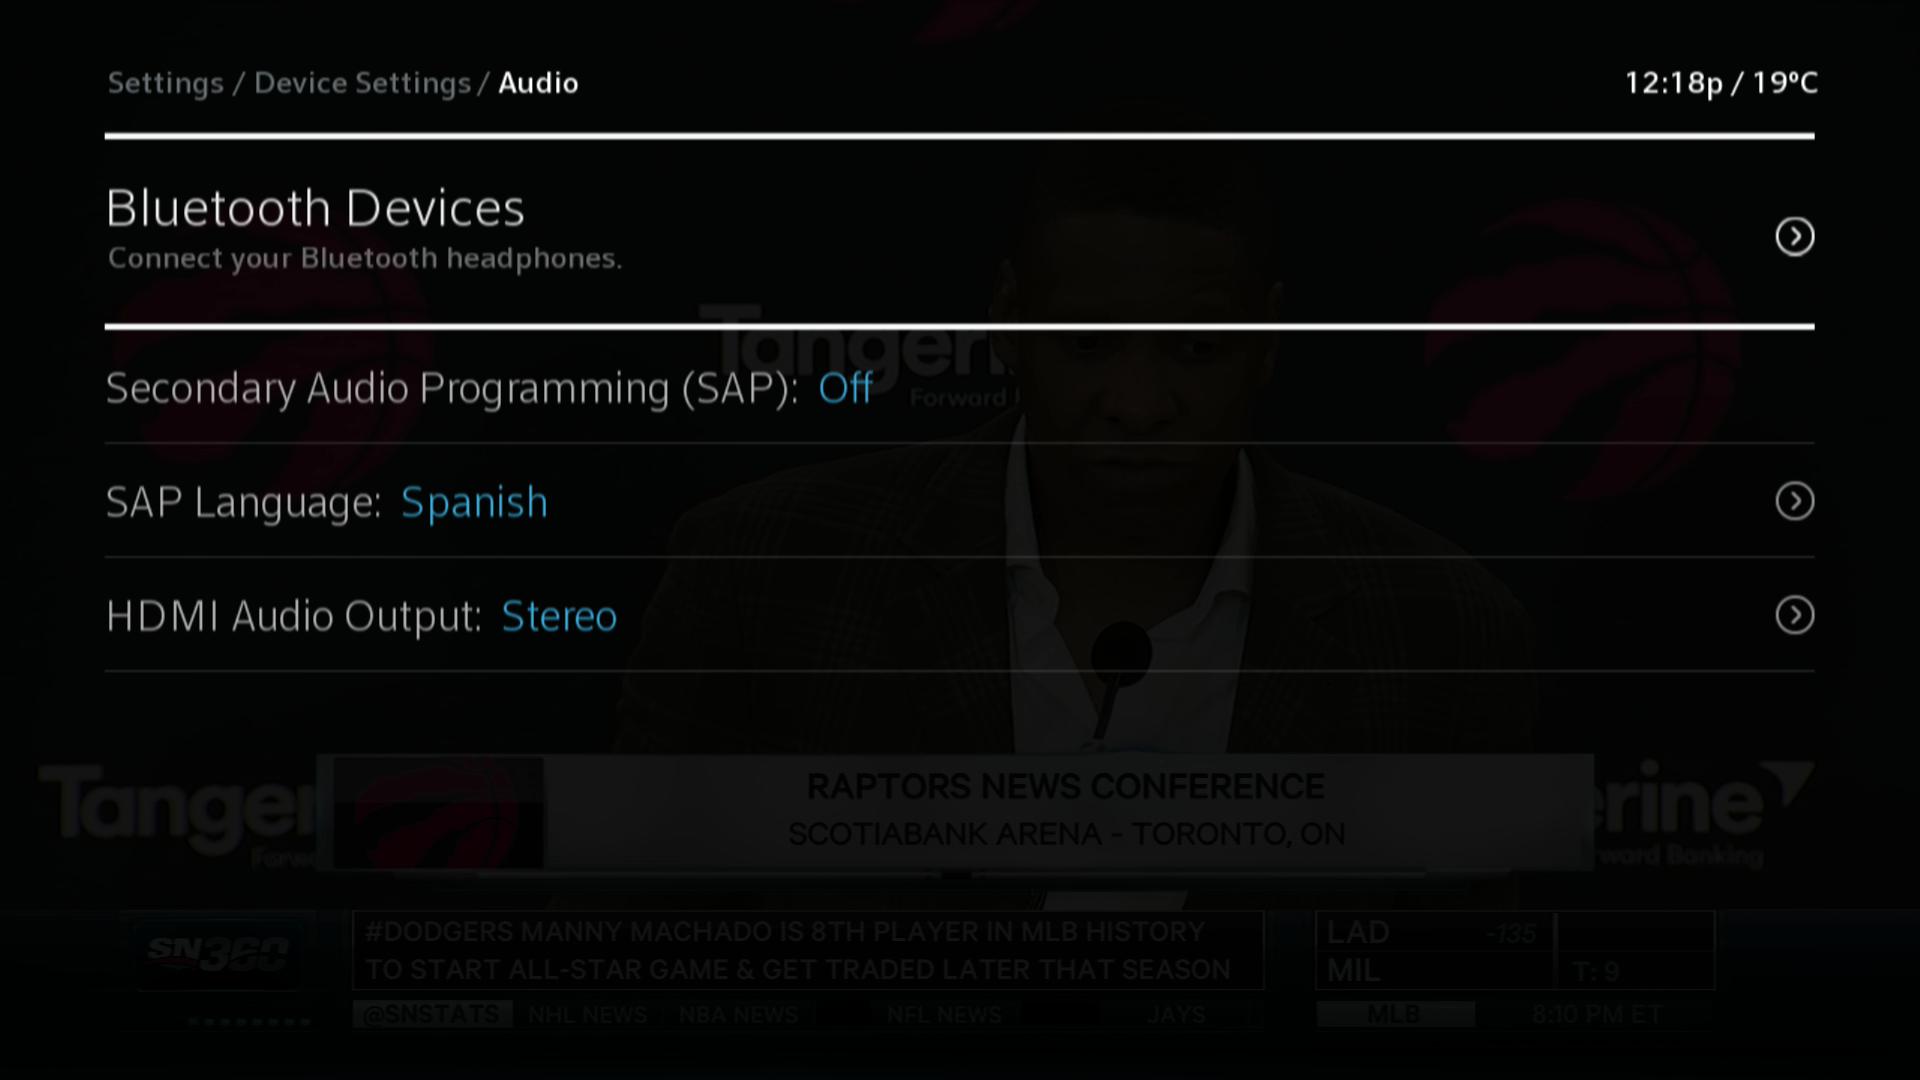 BlueCurve TV Settings > Device Settings > Audio > Bluetooth Devices